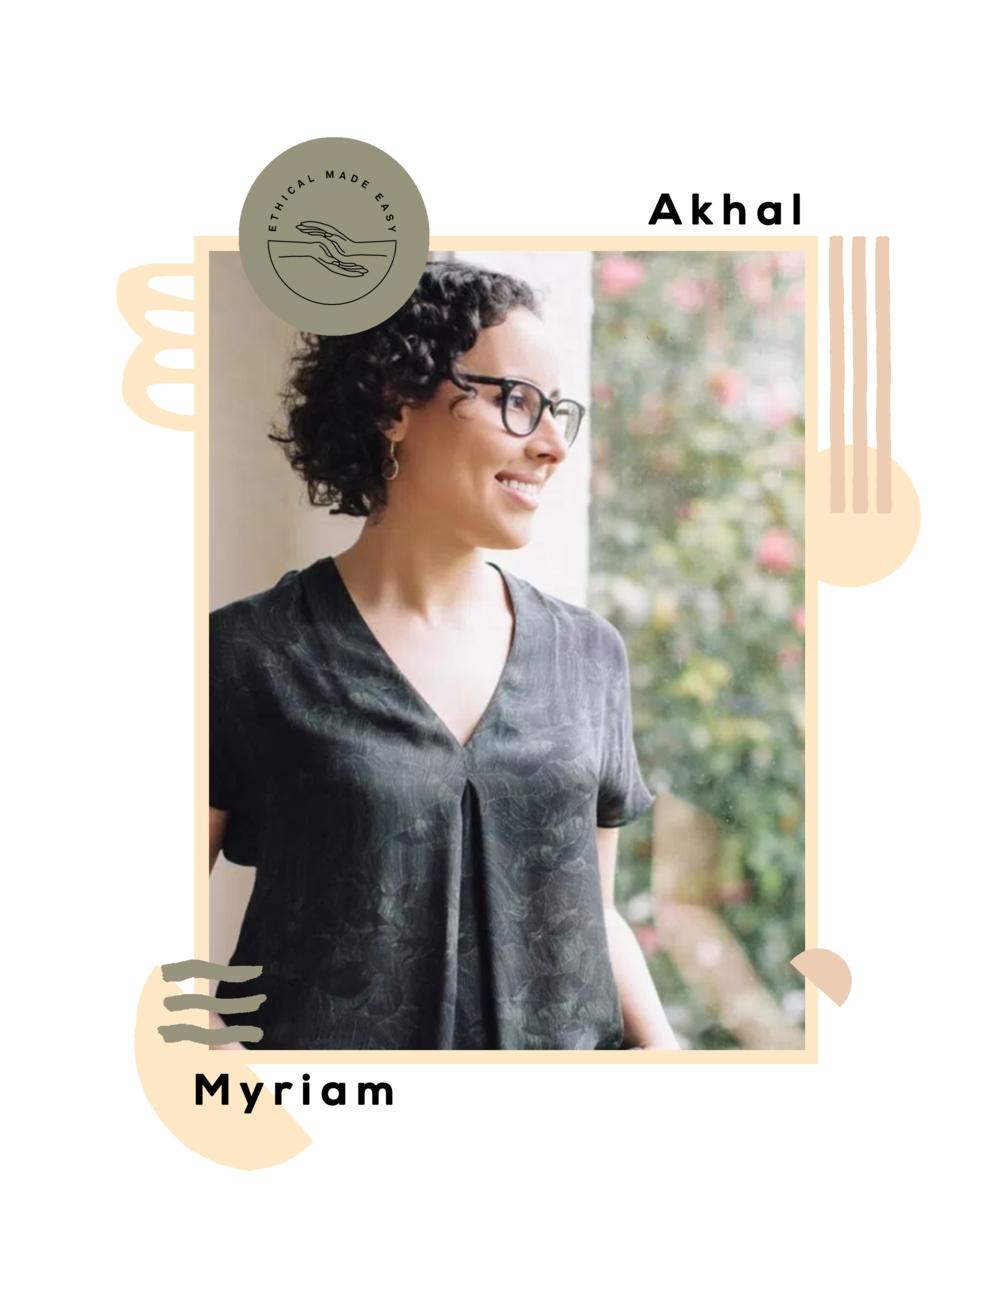 myriam-akhal-founder.png